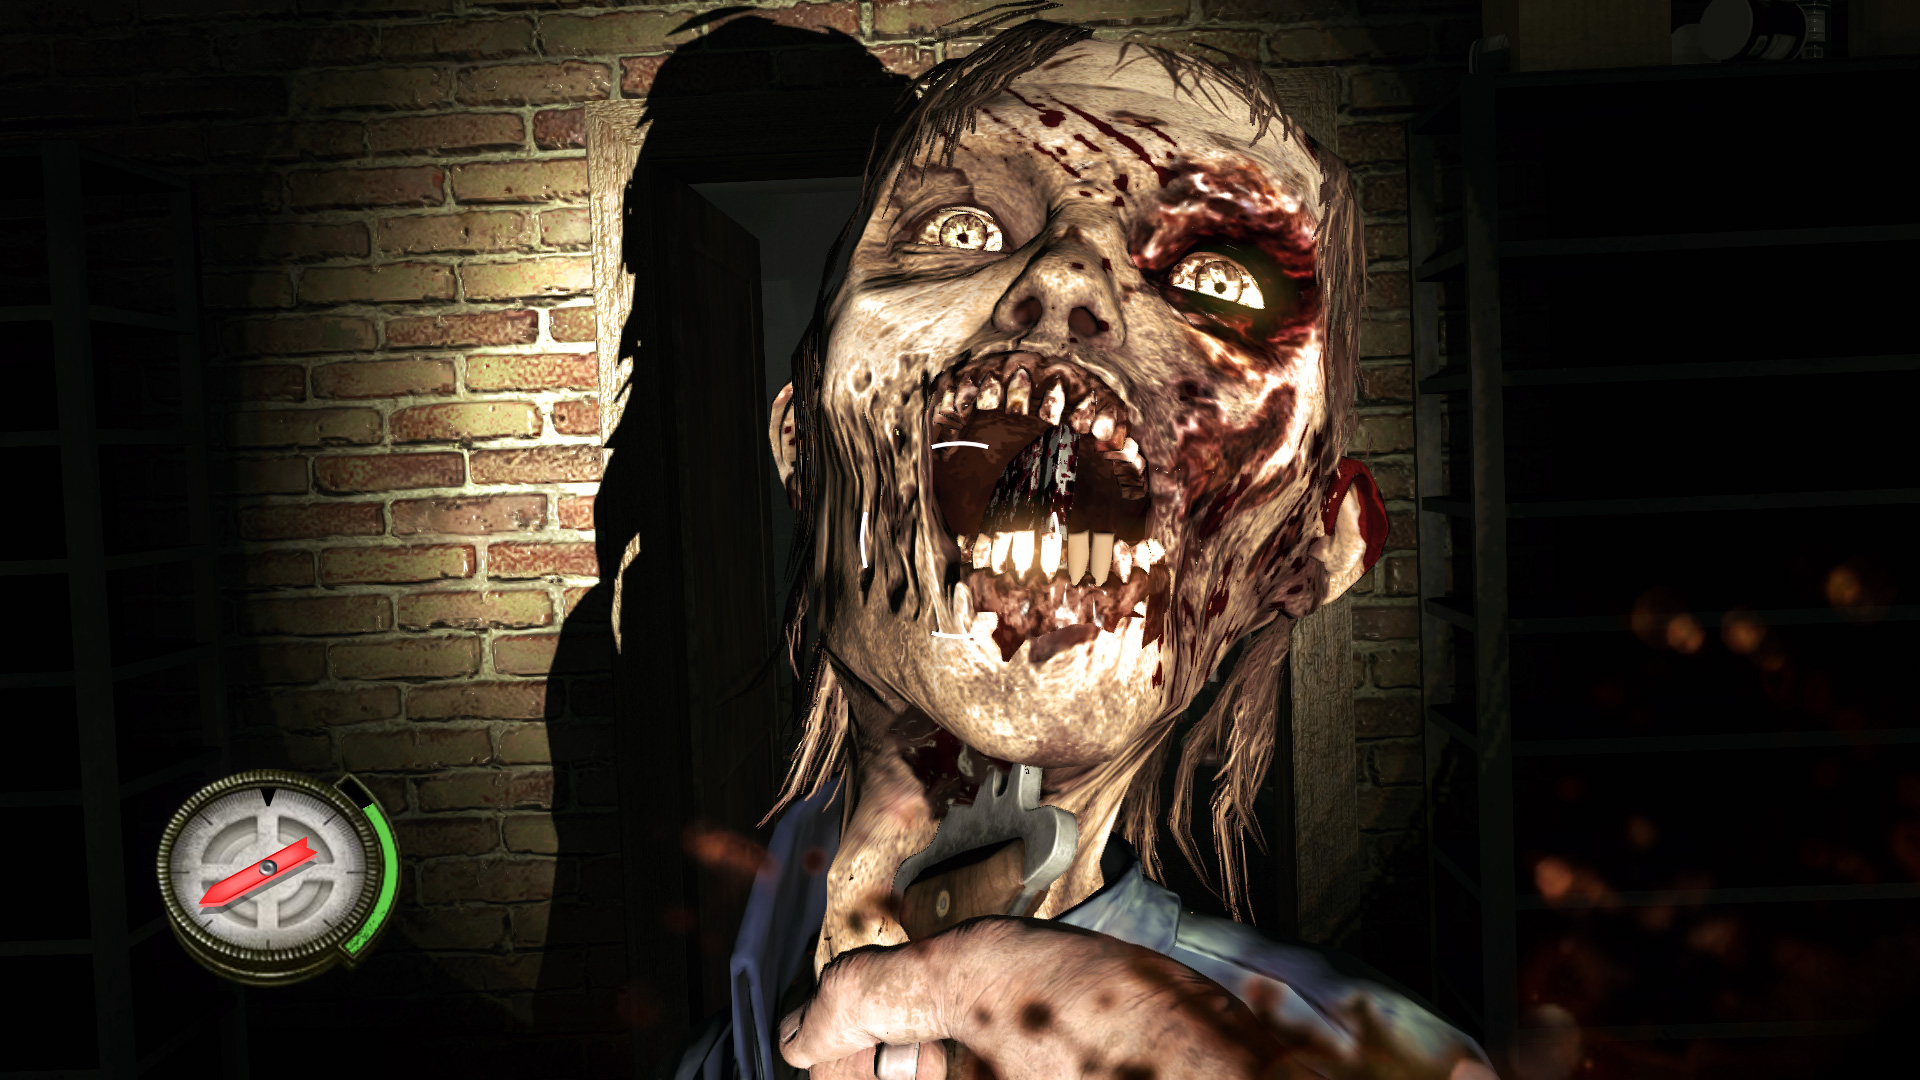 TheWalkingDeadSI Screenshot7 Download The Walking Dead: Survival Instinct   Reloaded (PC Game)